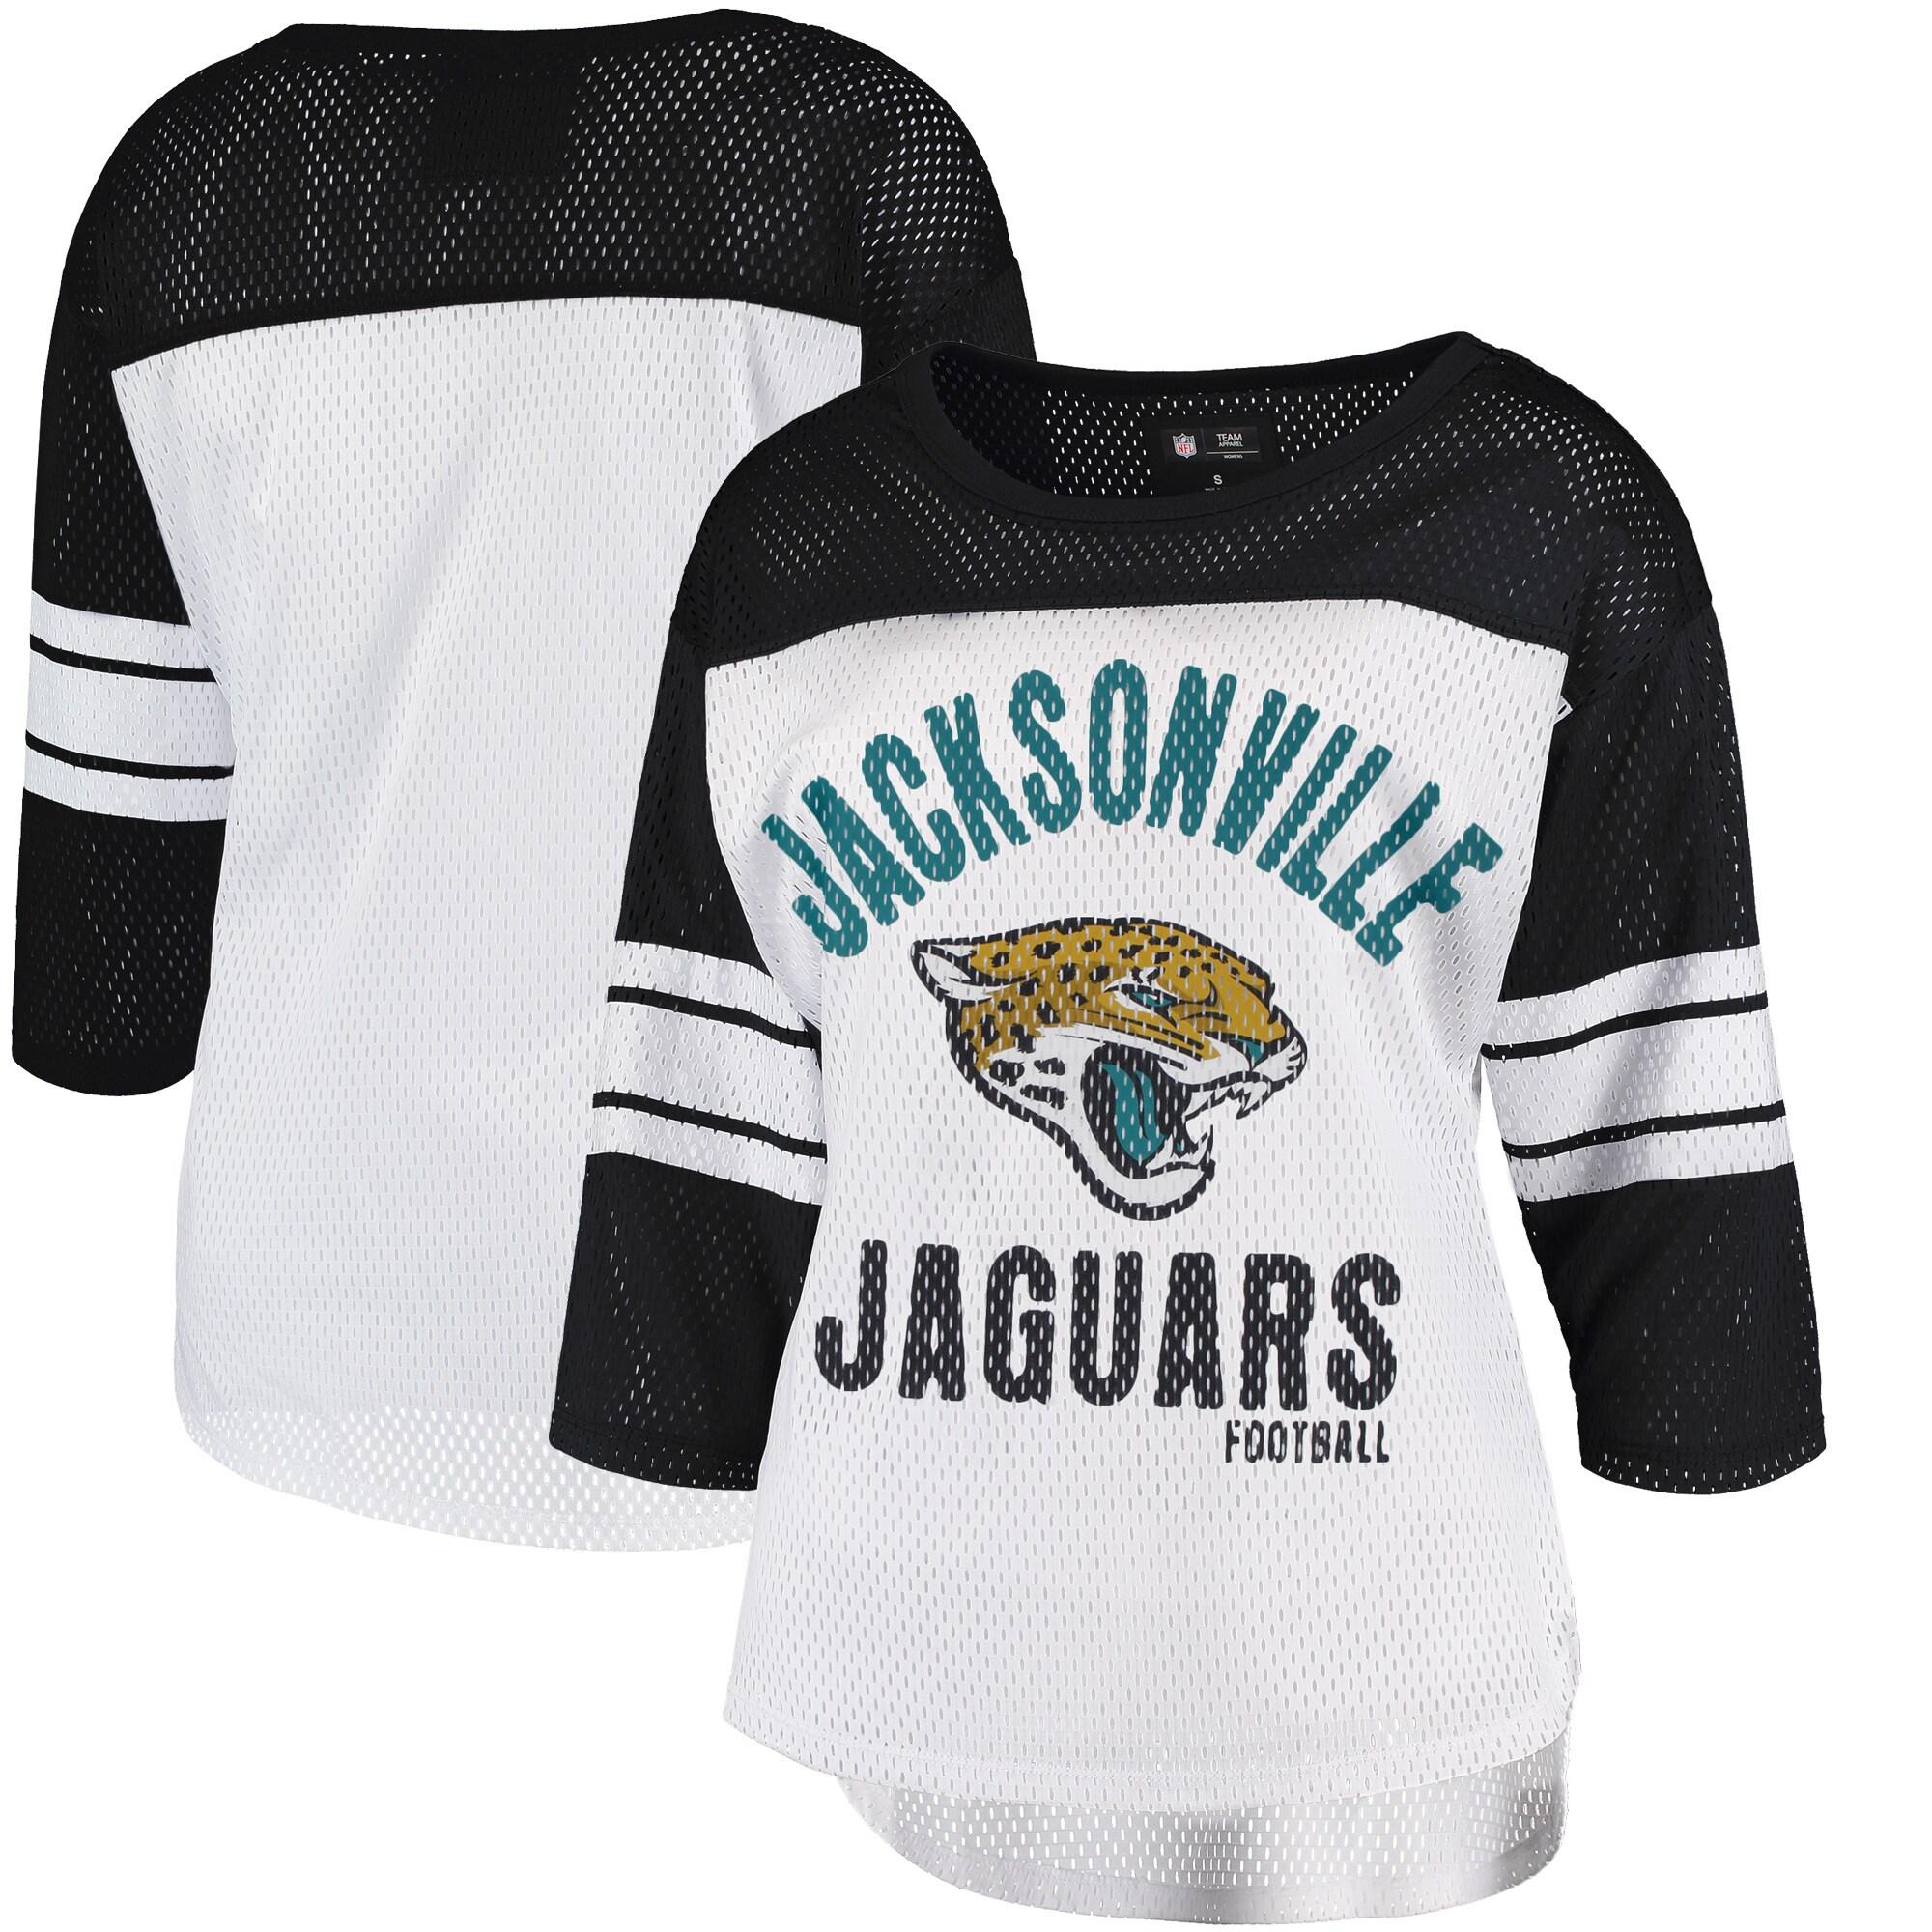 Jacksonville Jaguars G-III 4Her by Carl Banks Women's First Team Three-Quarter Sleeve Mesh T-Shirt - White/Black